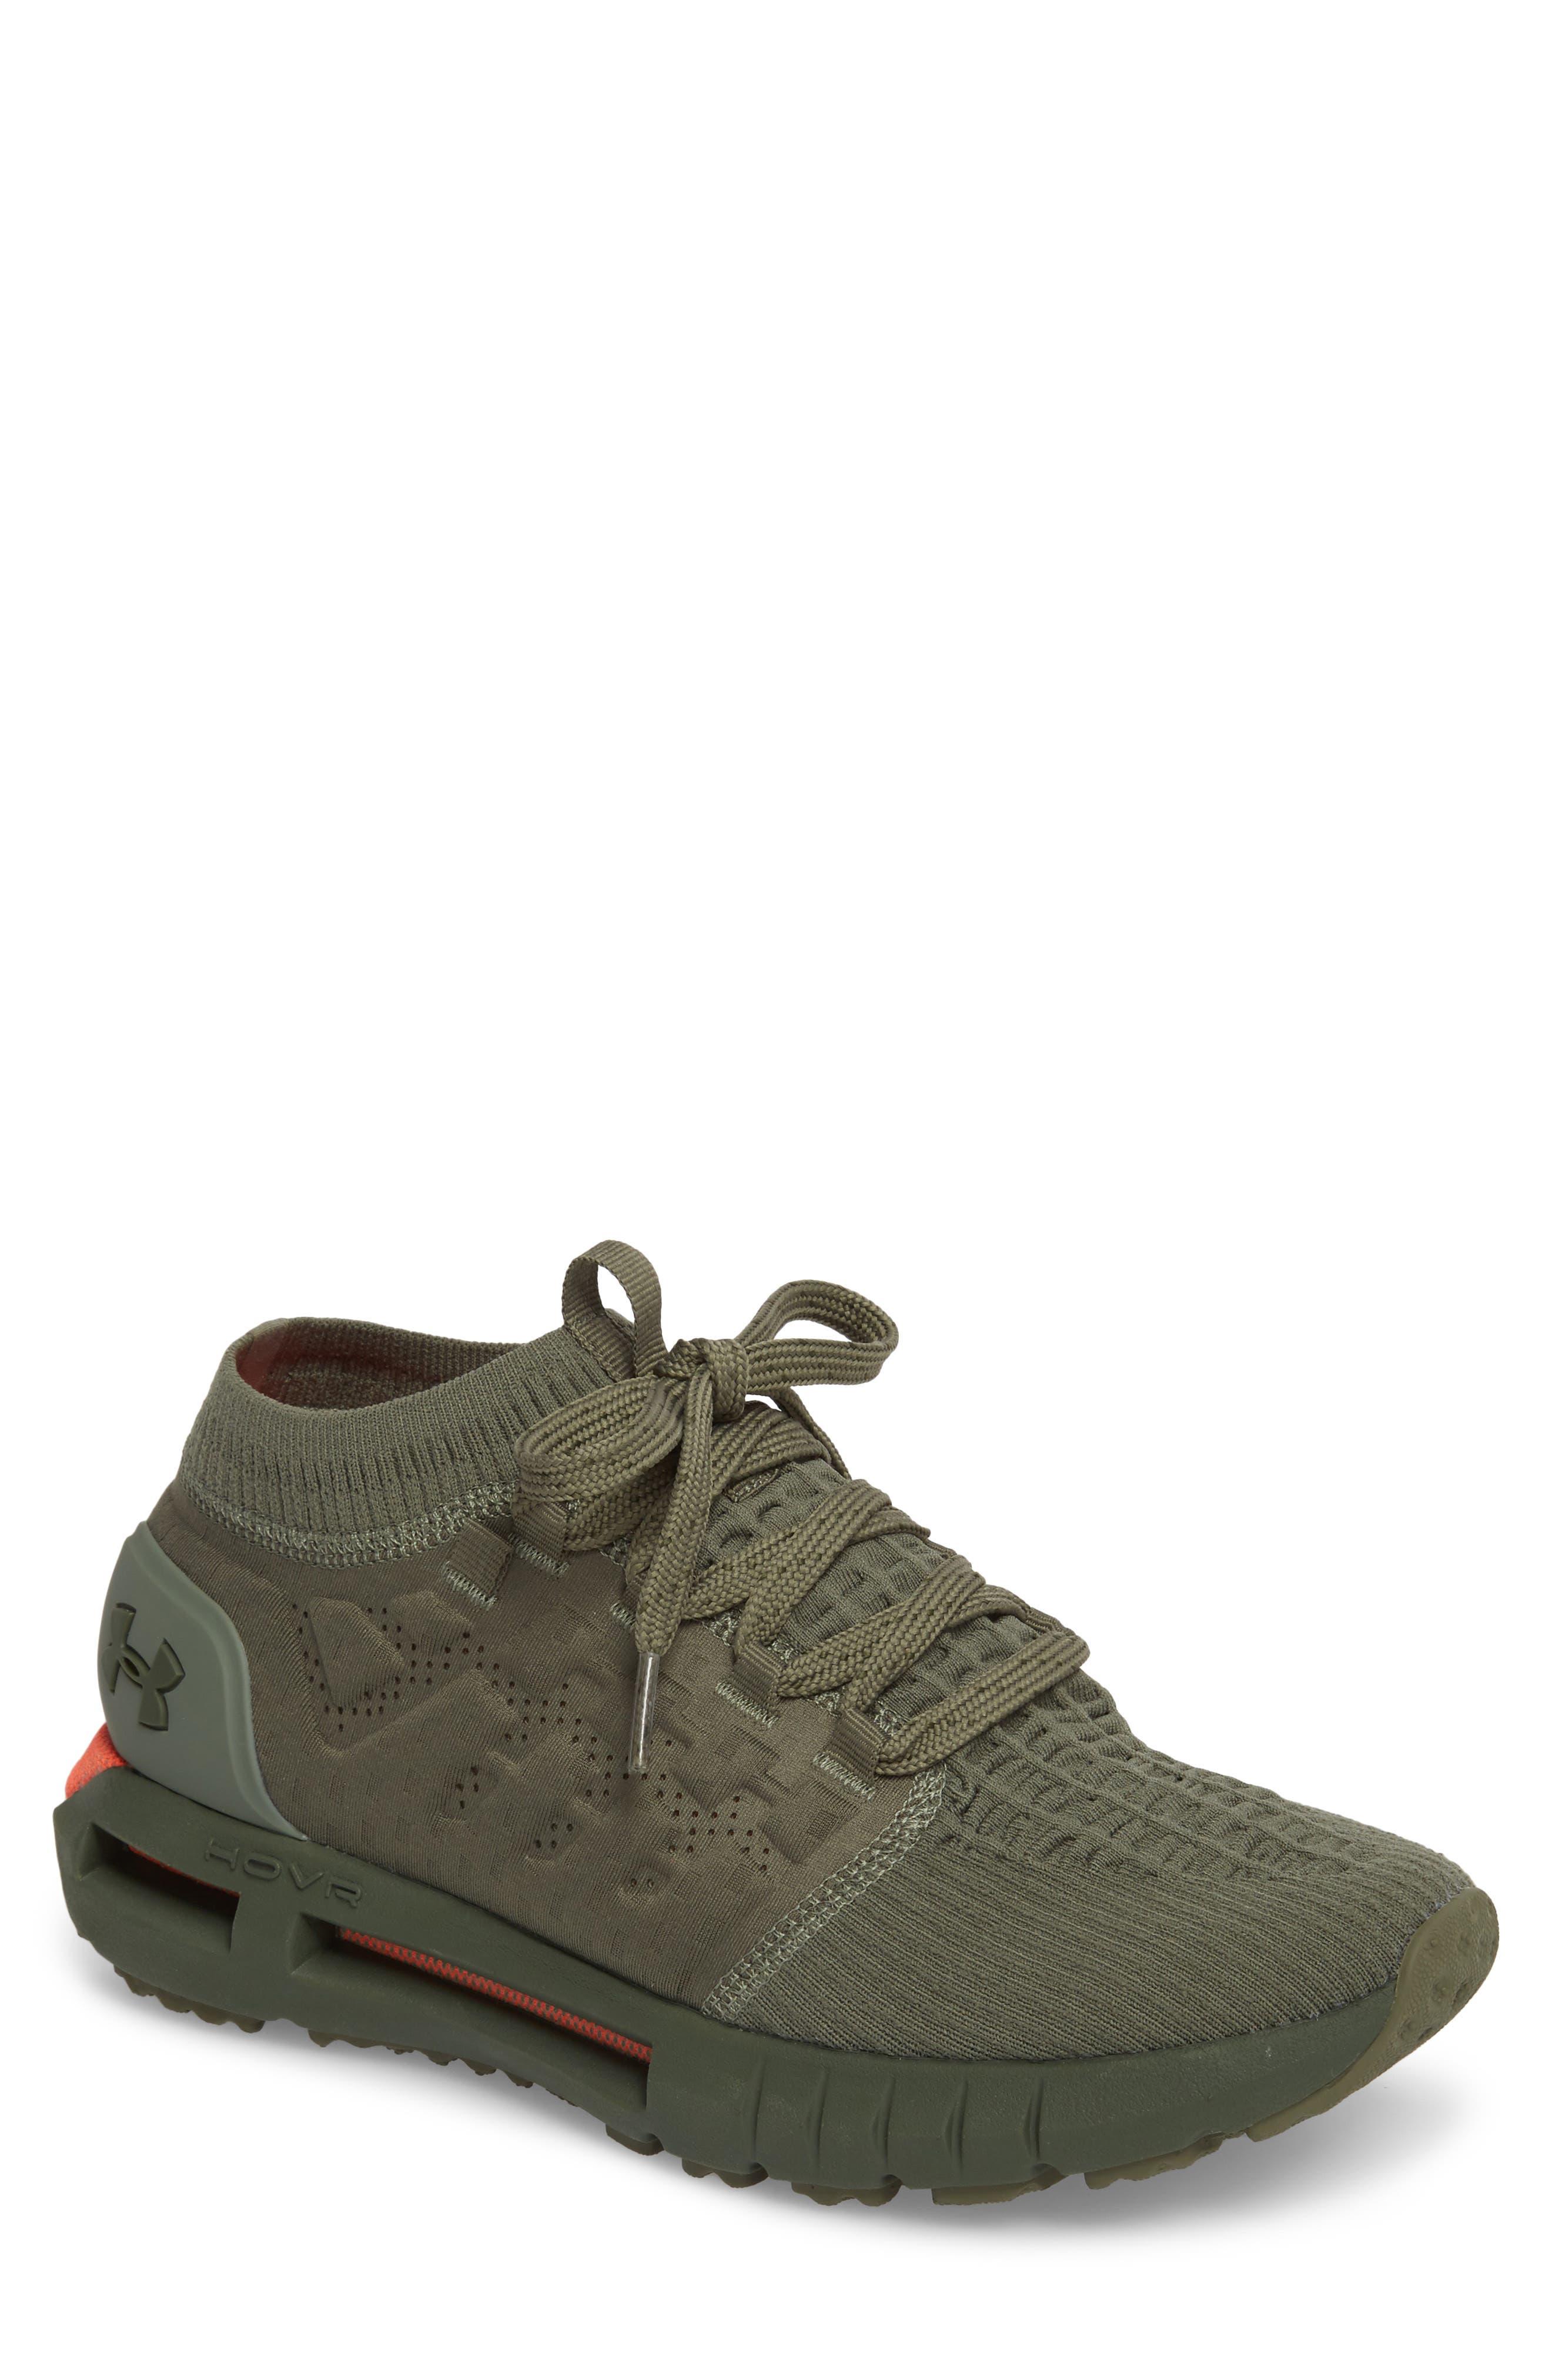 Under Armour HOVR Phantom NC Sneaker (Men)